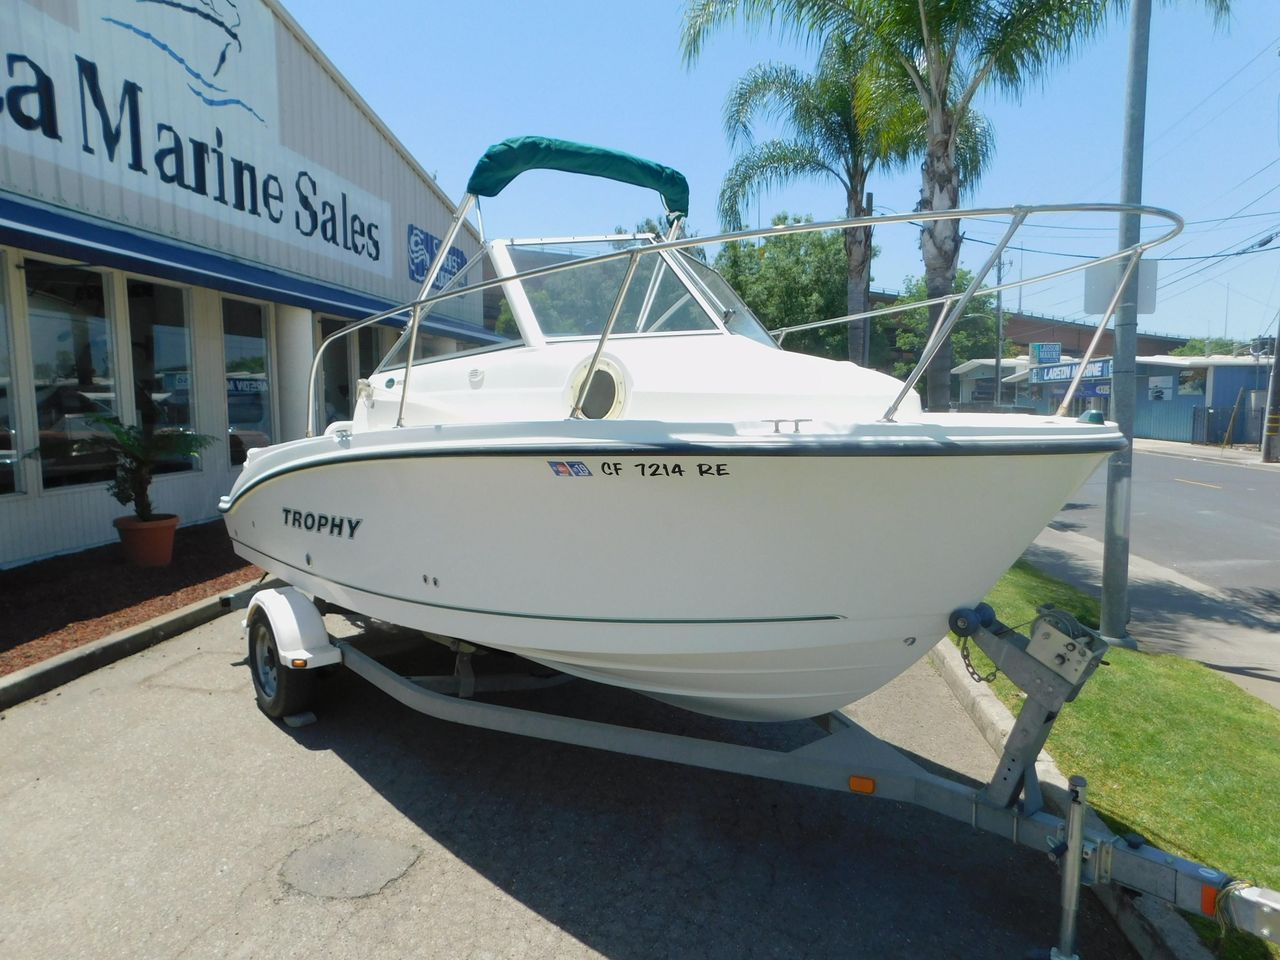 2005 Used Bayliner Trophy Freshwater Fishing Boat For Sale - $15,900